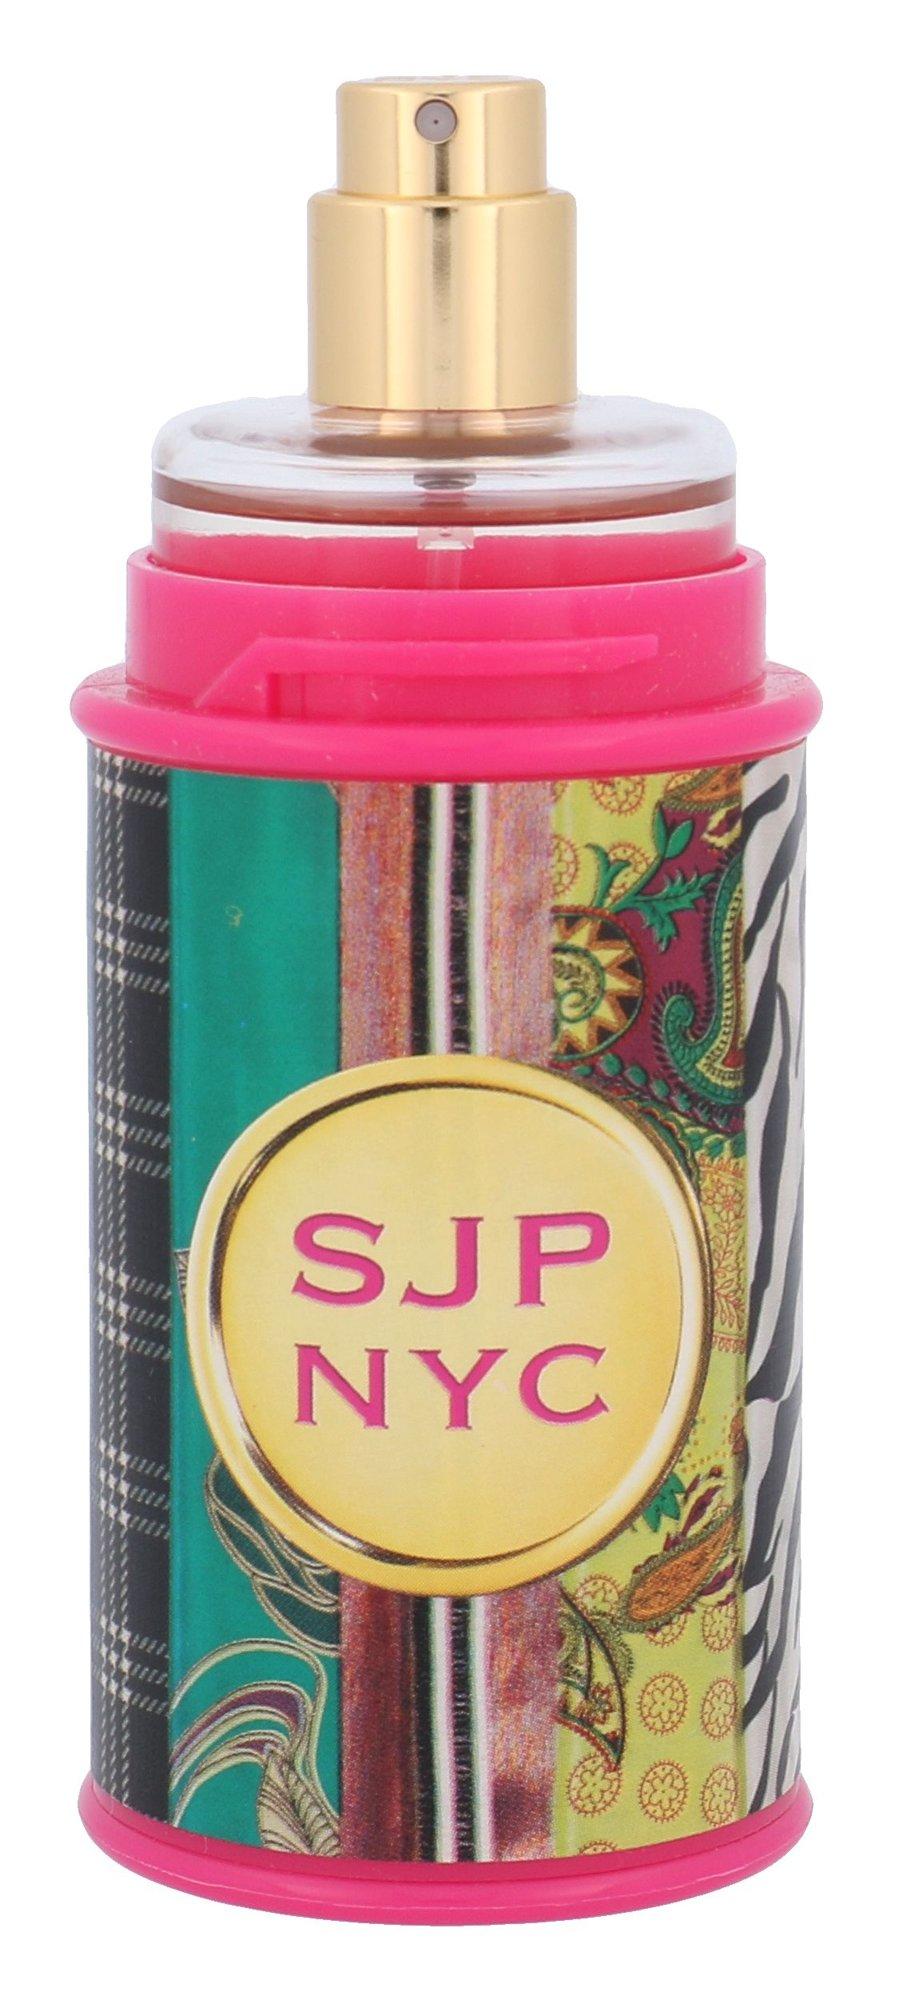 Sarah Jessica Parker SJP NYC EDT 60ml